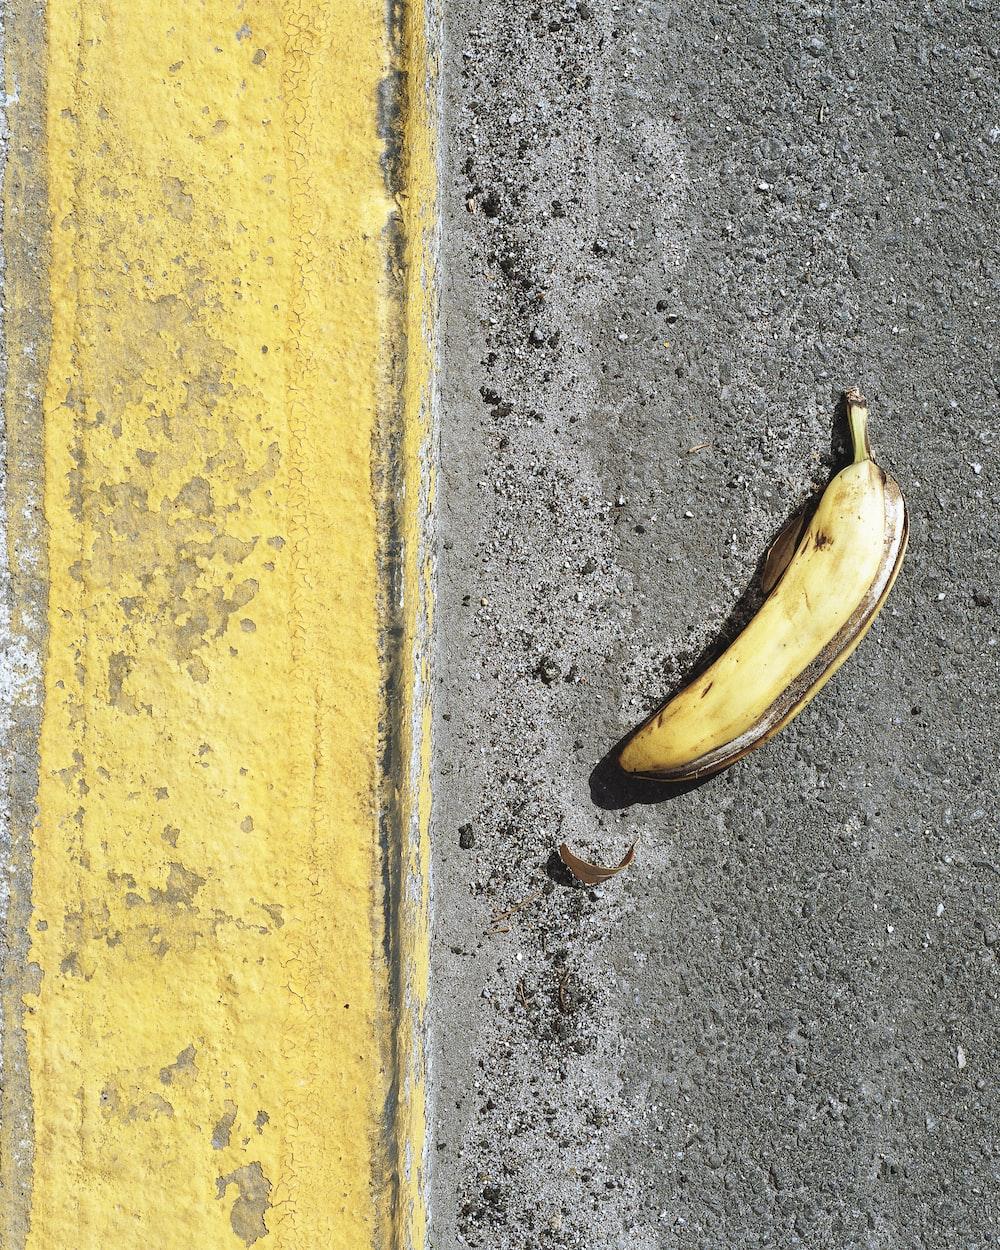 banana peel on the road